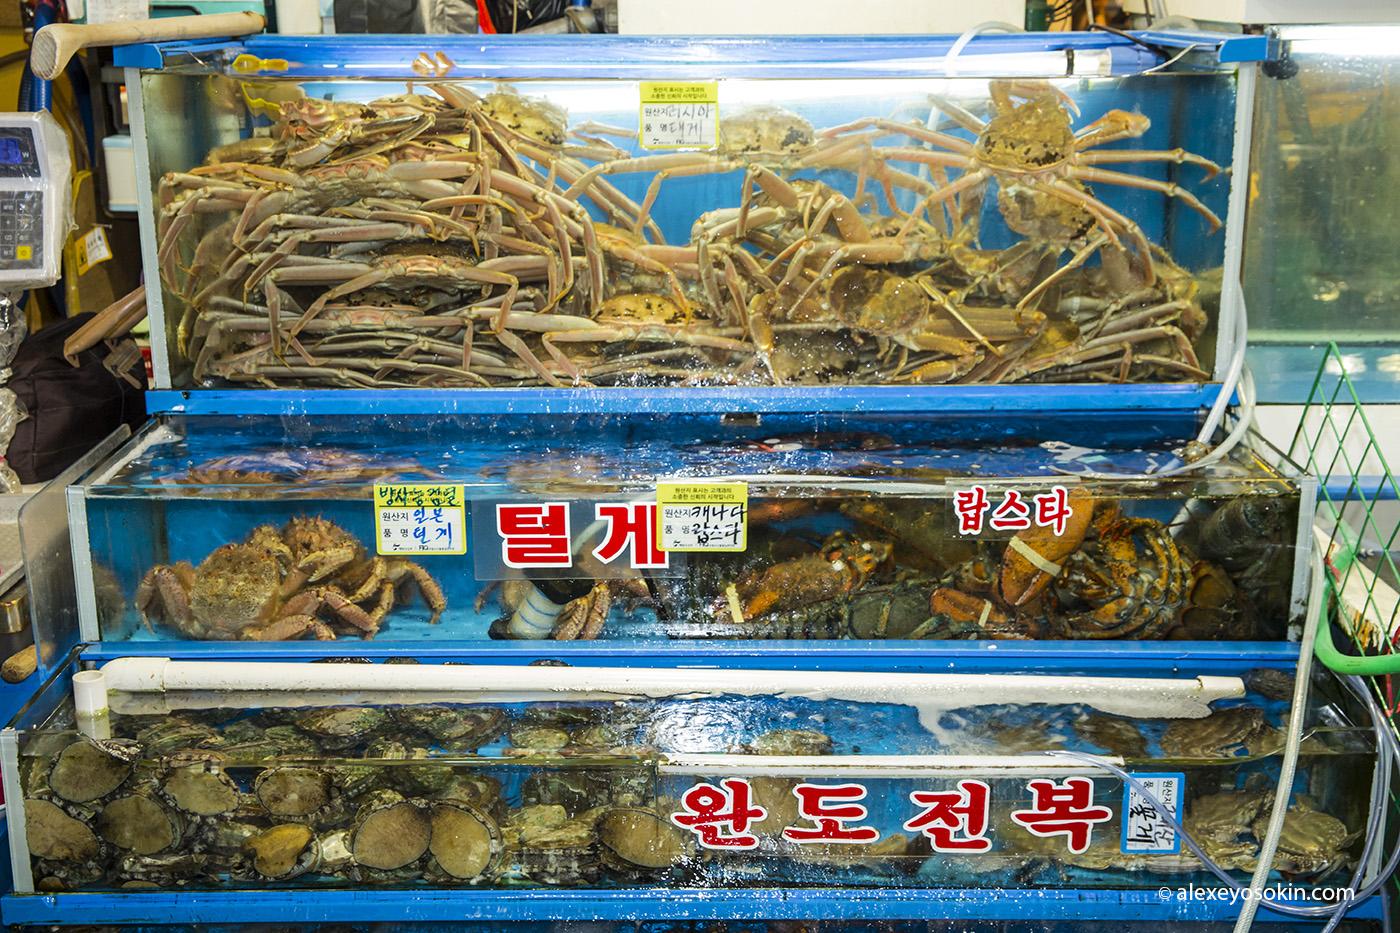 seoul_fish_market_6_ao